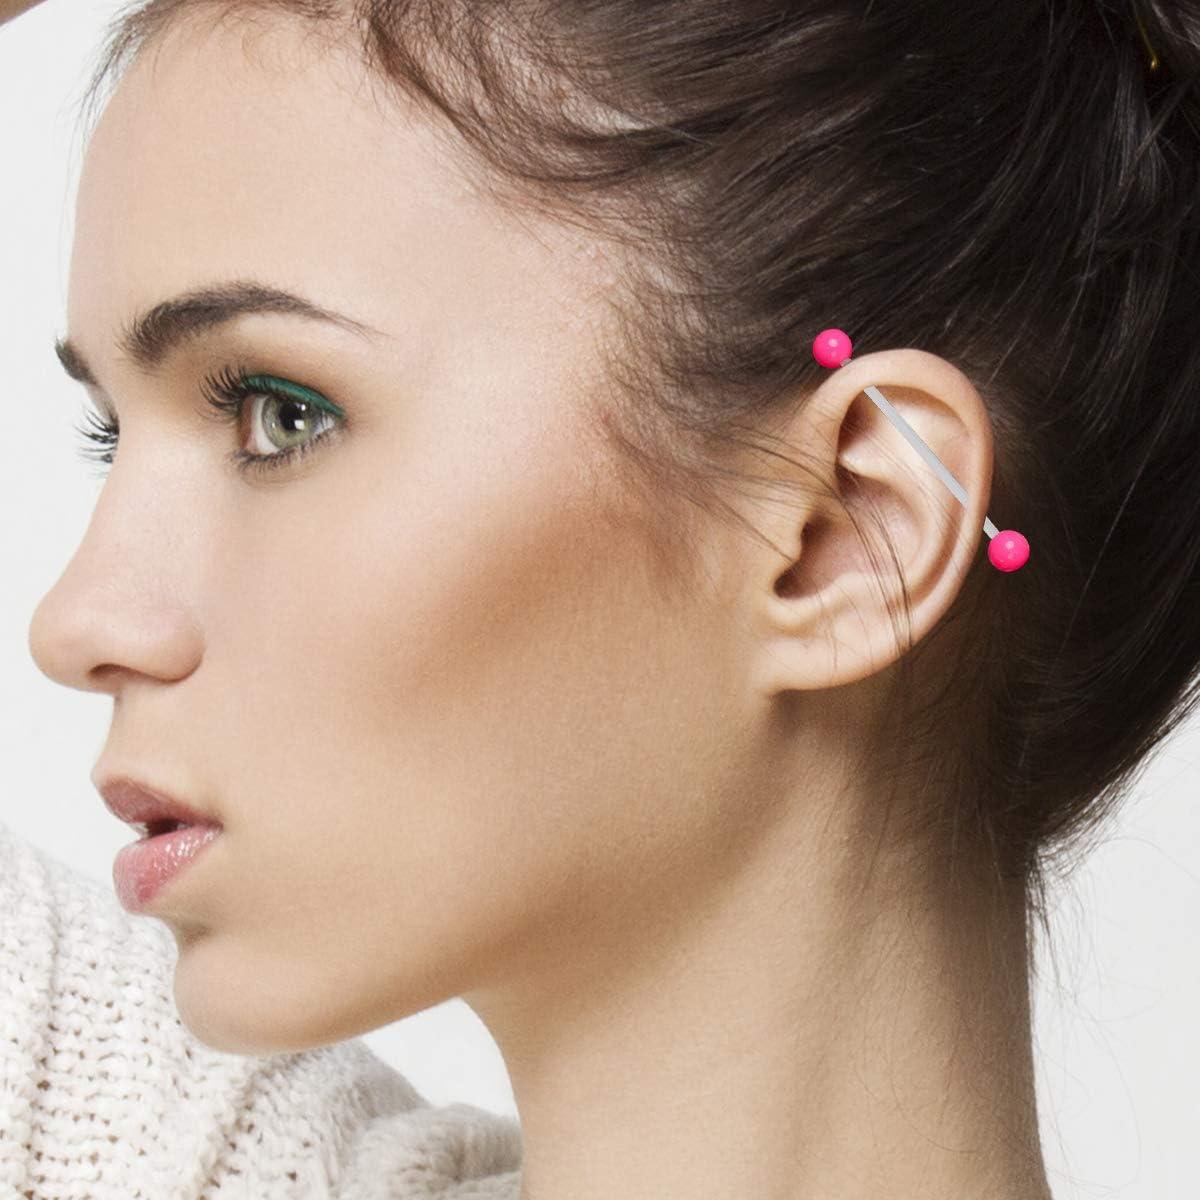 CrazyPiercing 10 Pcs Industrial Barbell Earrings 14G Bioflex Cartilage Earring Body Piercing Jewelry 38mm Bar Colorful Acrylic Balls